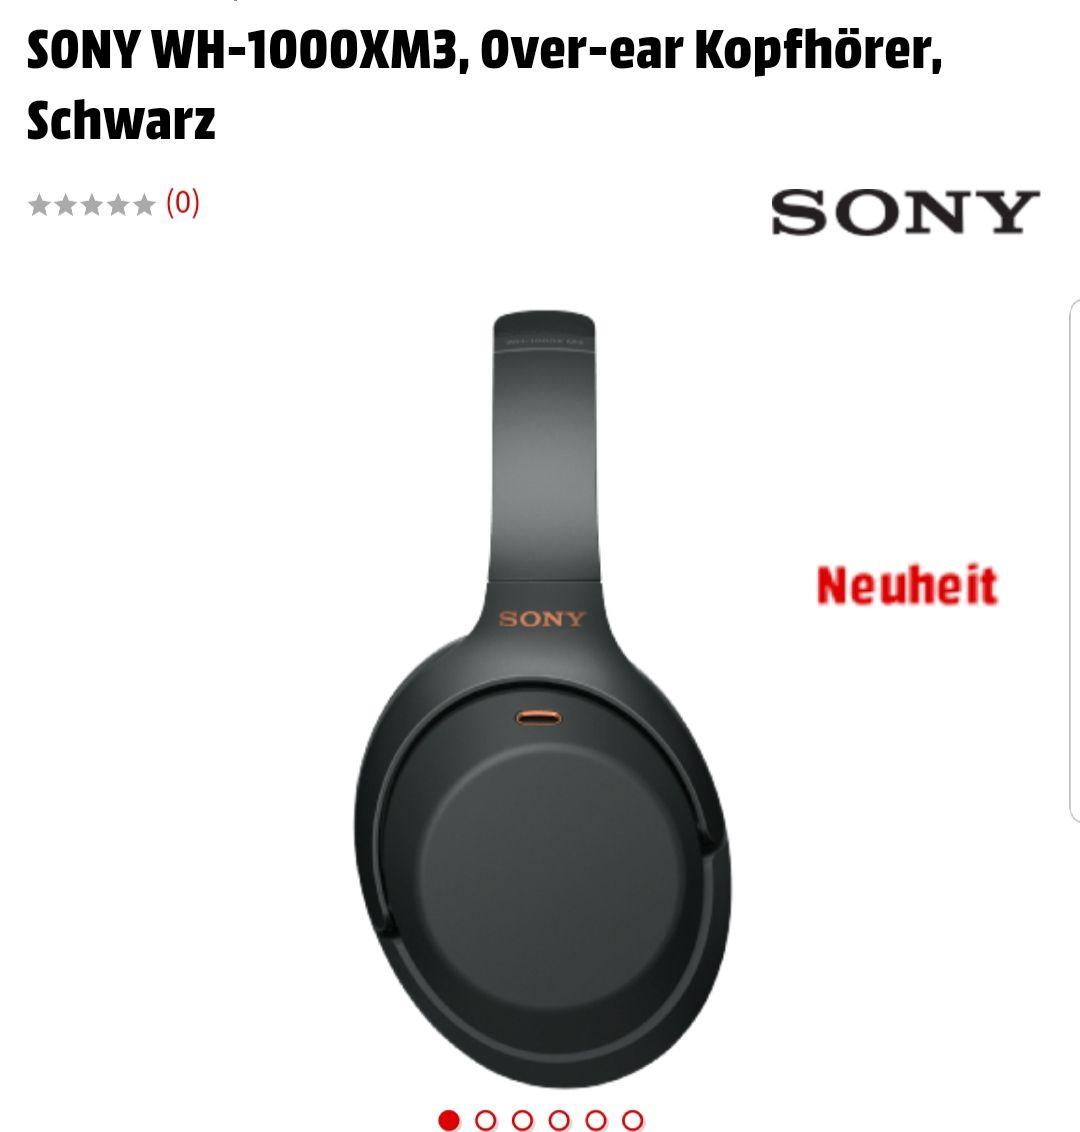 Sony WH-1000XM3 bei Saturn Media Markt 19% Aktion